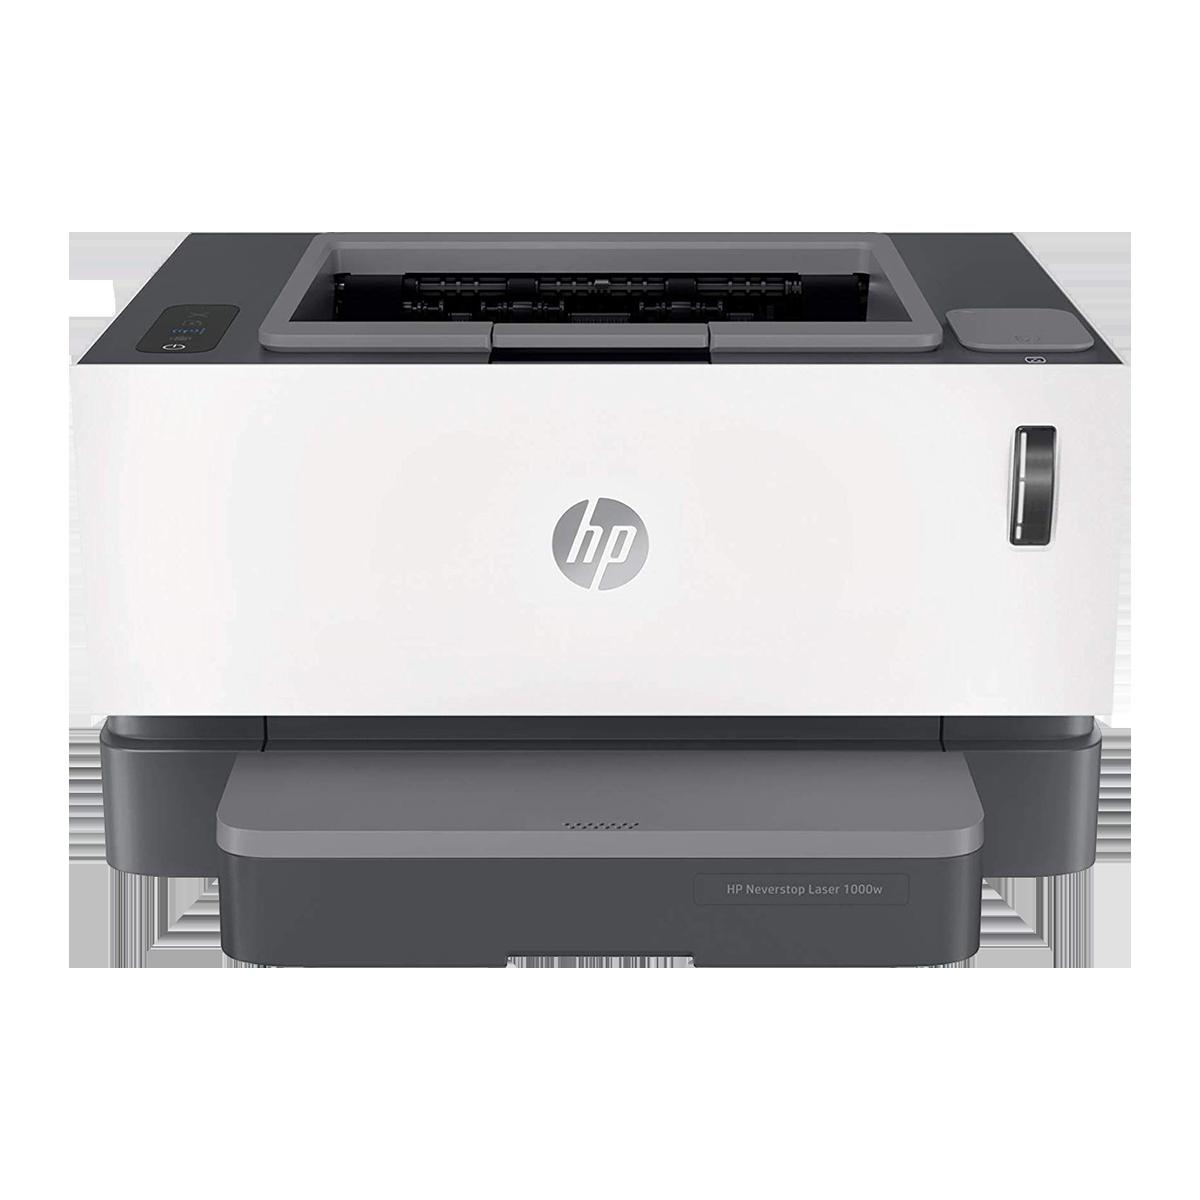 HP Neverstop Laser Tank Printer (4RY23A, White & Grey)_1